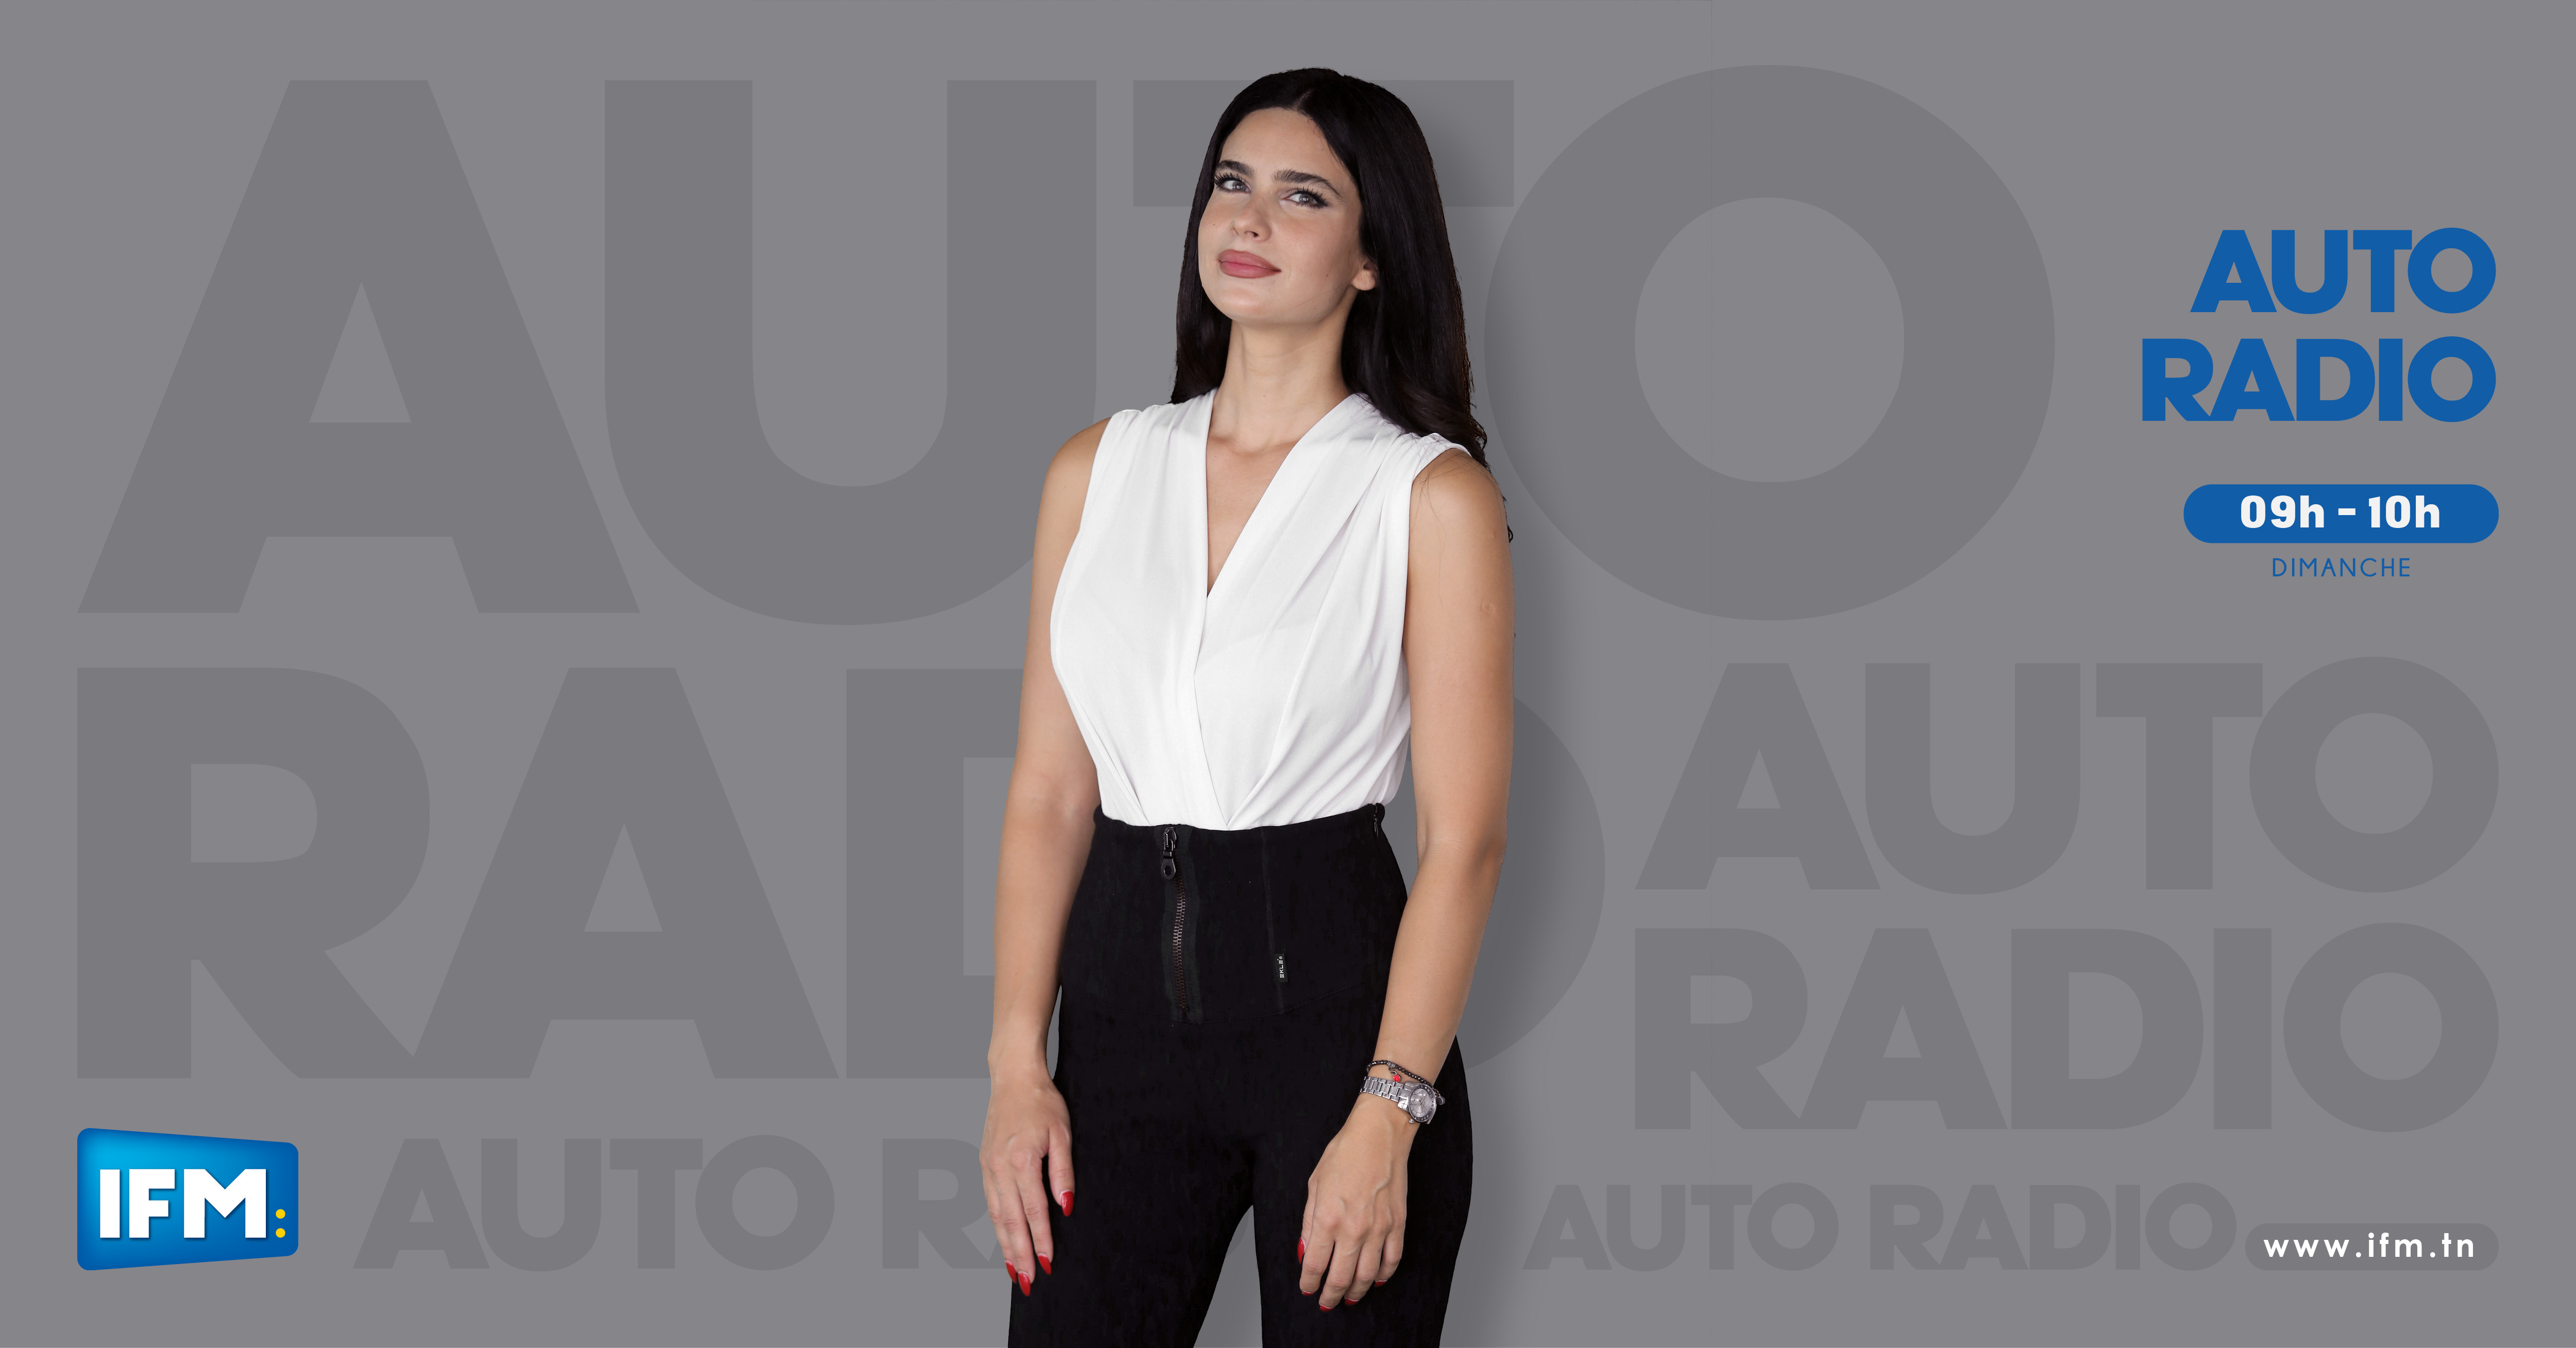 Auto راديو Auto Radio S3-EP 20| الصين تصنع نسخ مقلدة للكراهب الغالية